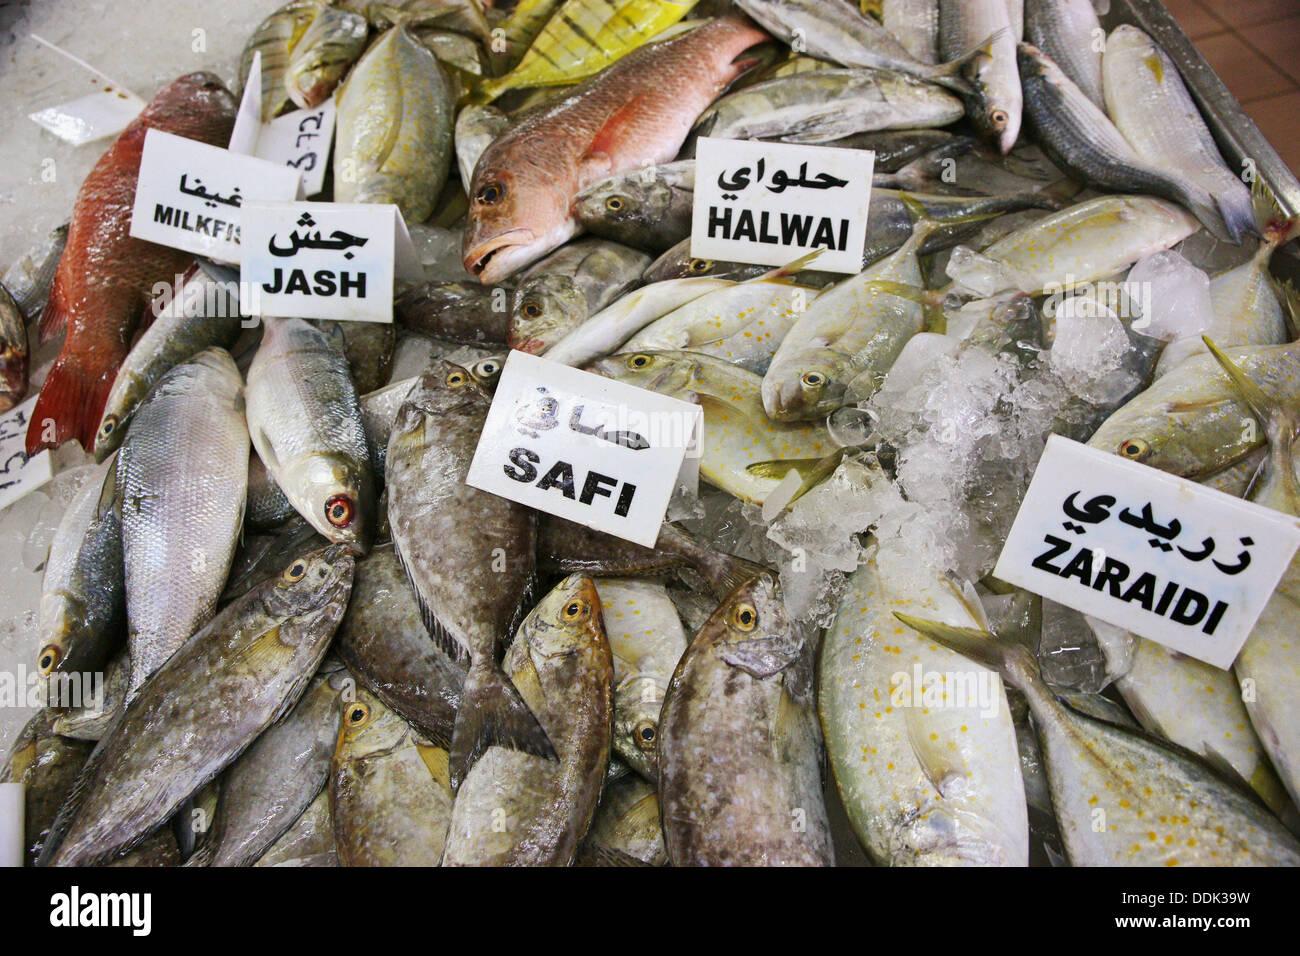 Abu Dhabi Fish Market Stock Photos & Abu Dhabi Fish Market